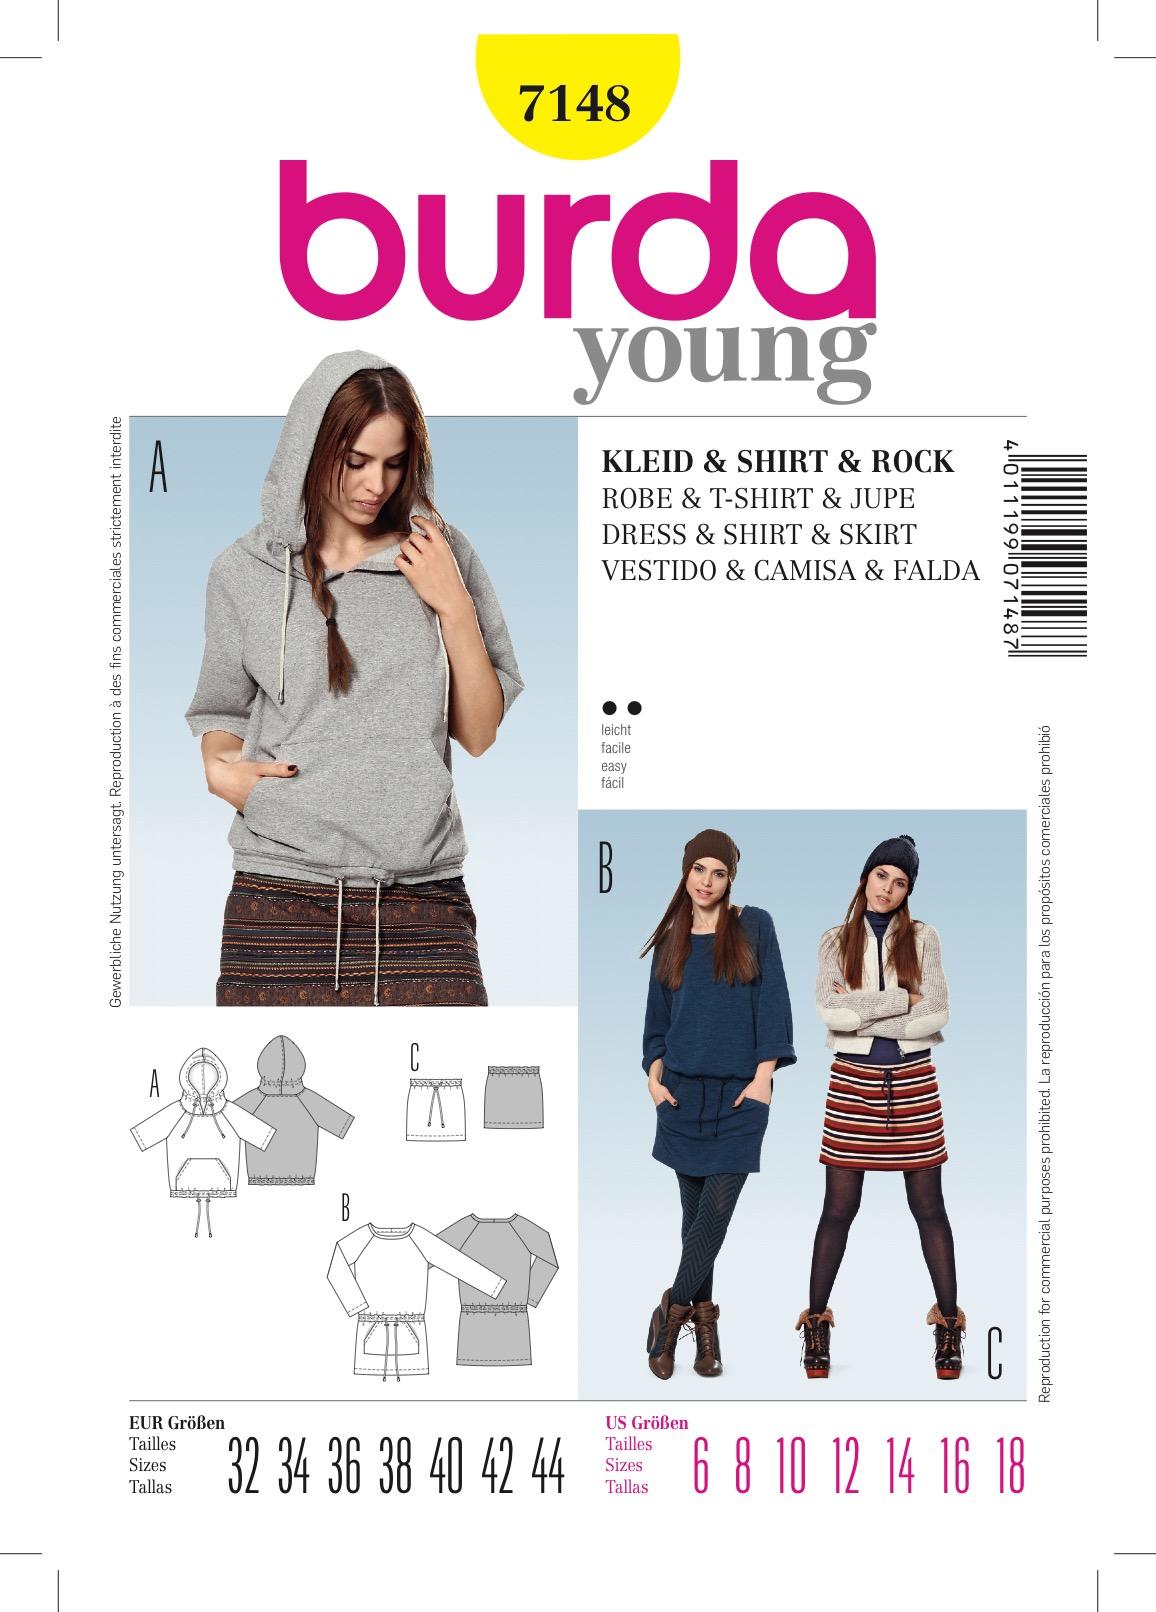 Burda 7148 Schnittmuster Kapuzenshirt Sweatshirtkleid Rock mit Kordelzug (Damen, Gr. 32 - 44) Level 2 leicht